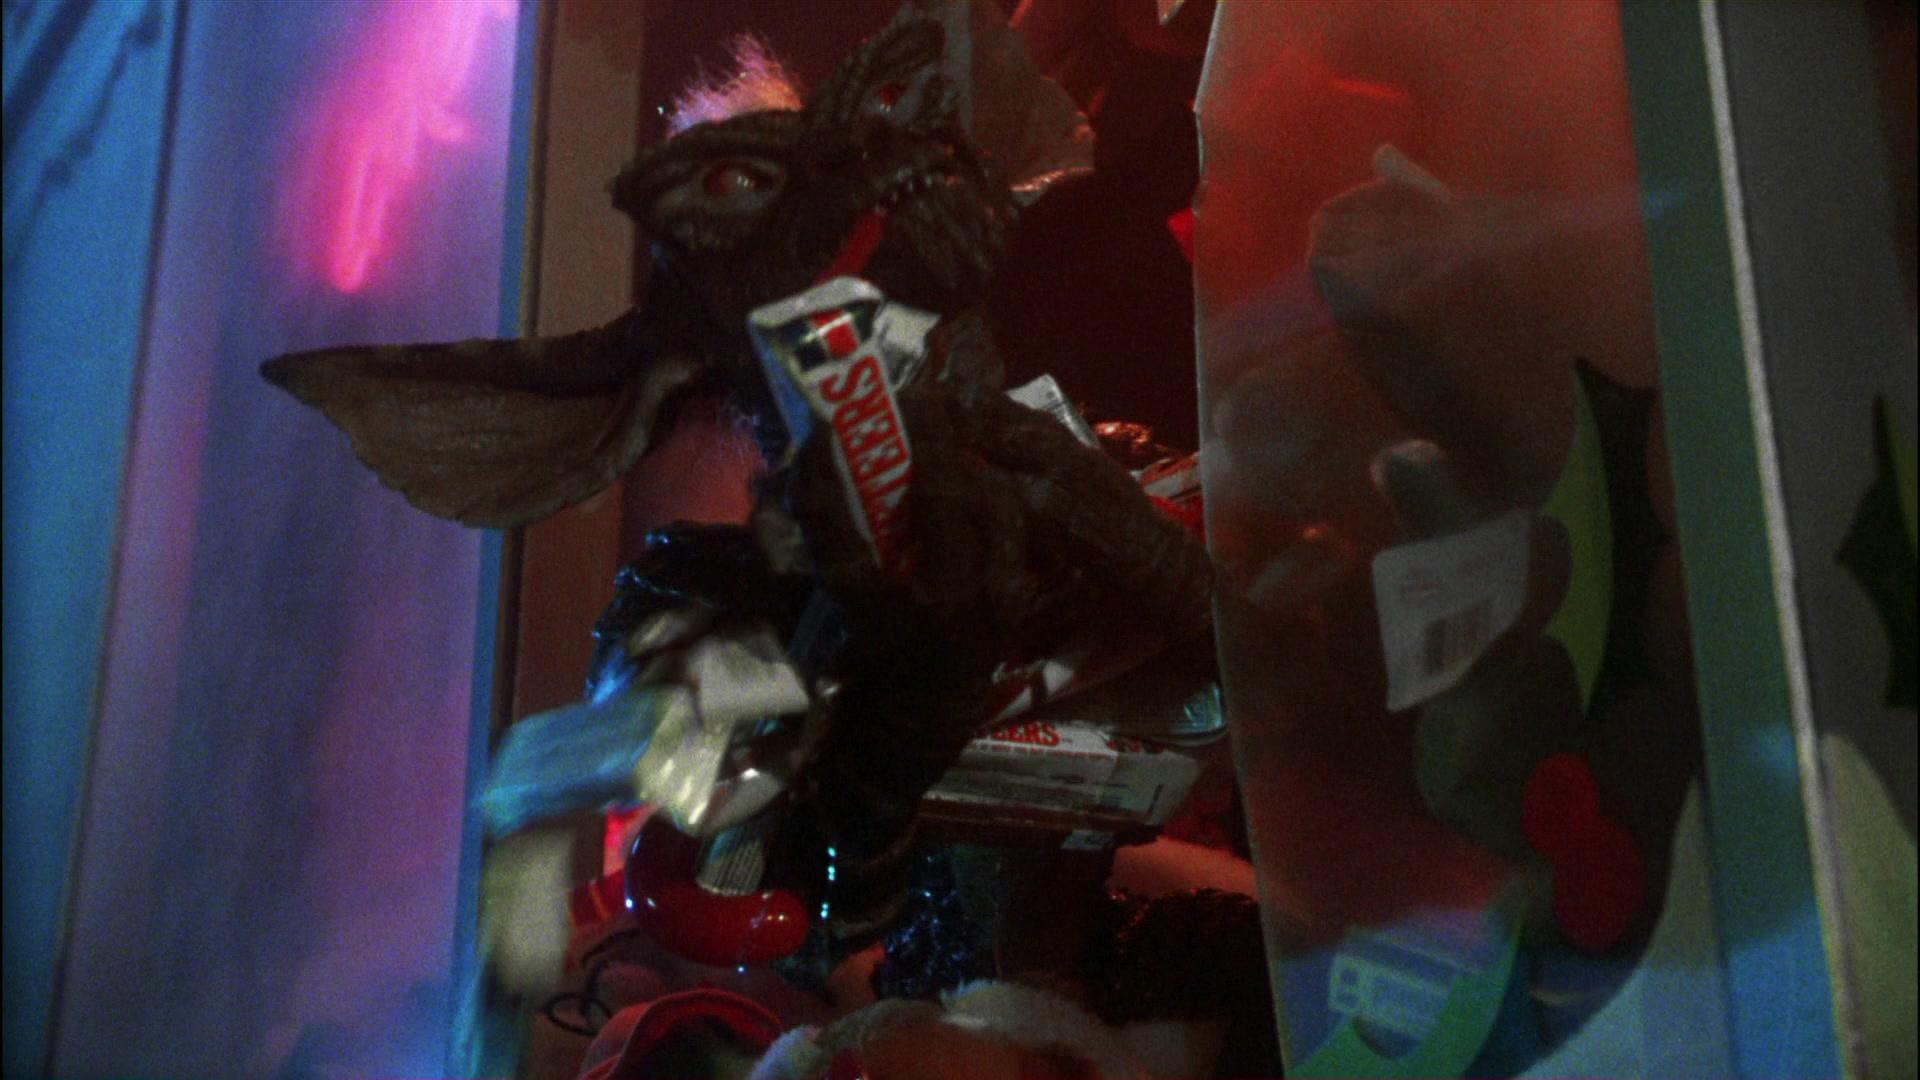 Alfa Romeo Giulia >> 3 Musketeers Chocolate Bars in Gremlins (1984) Movie